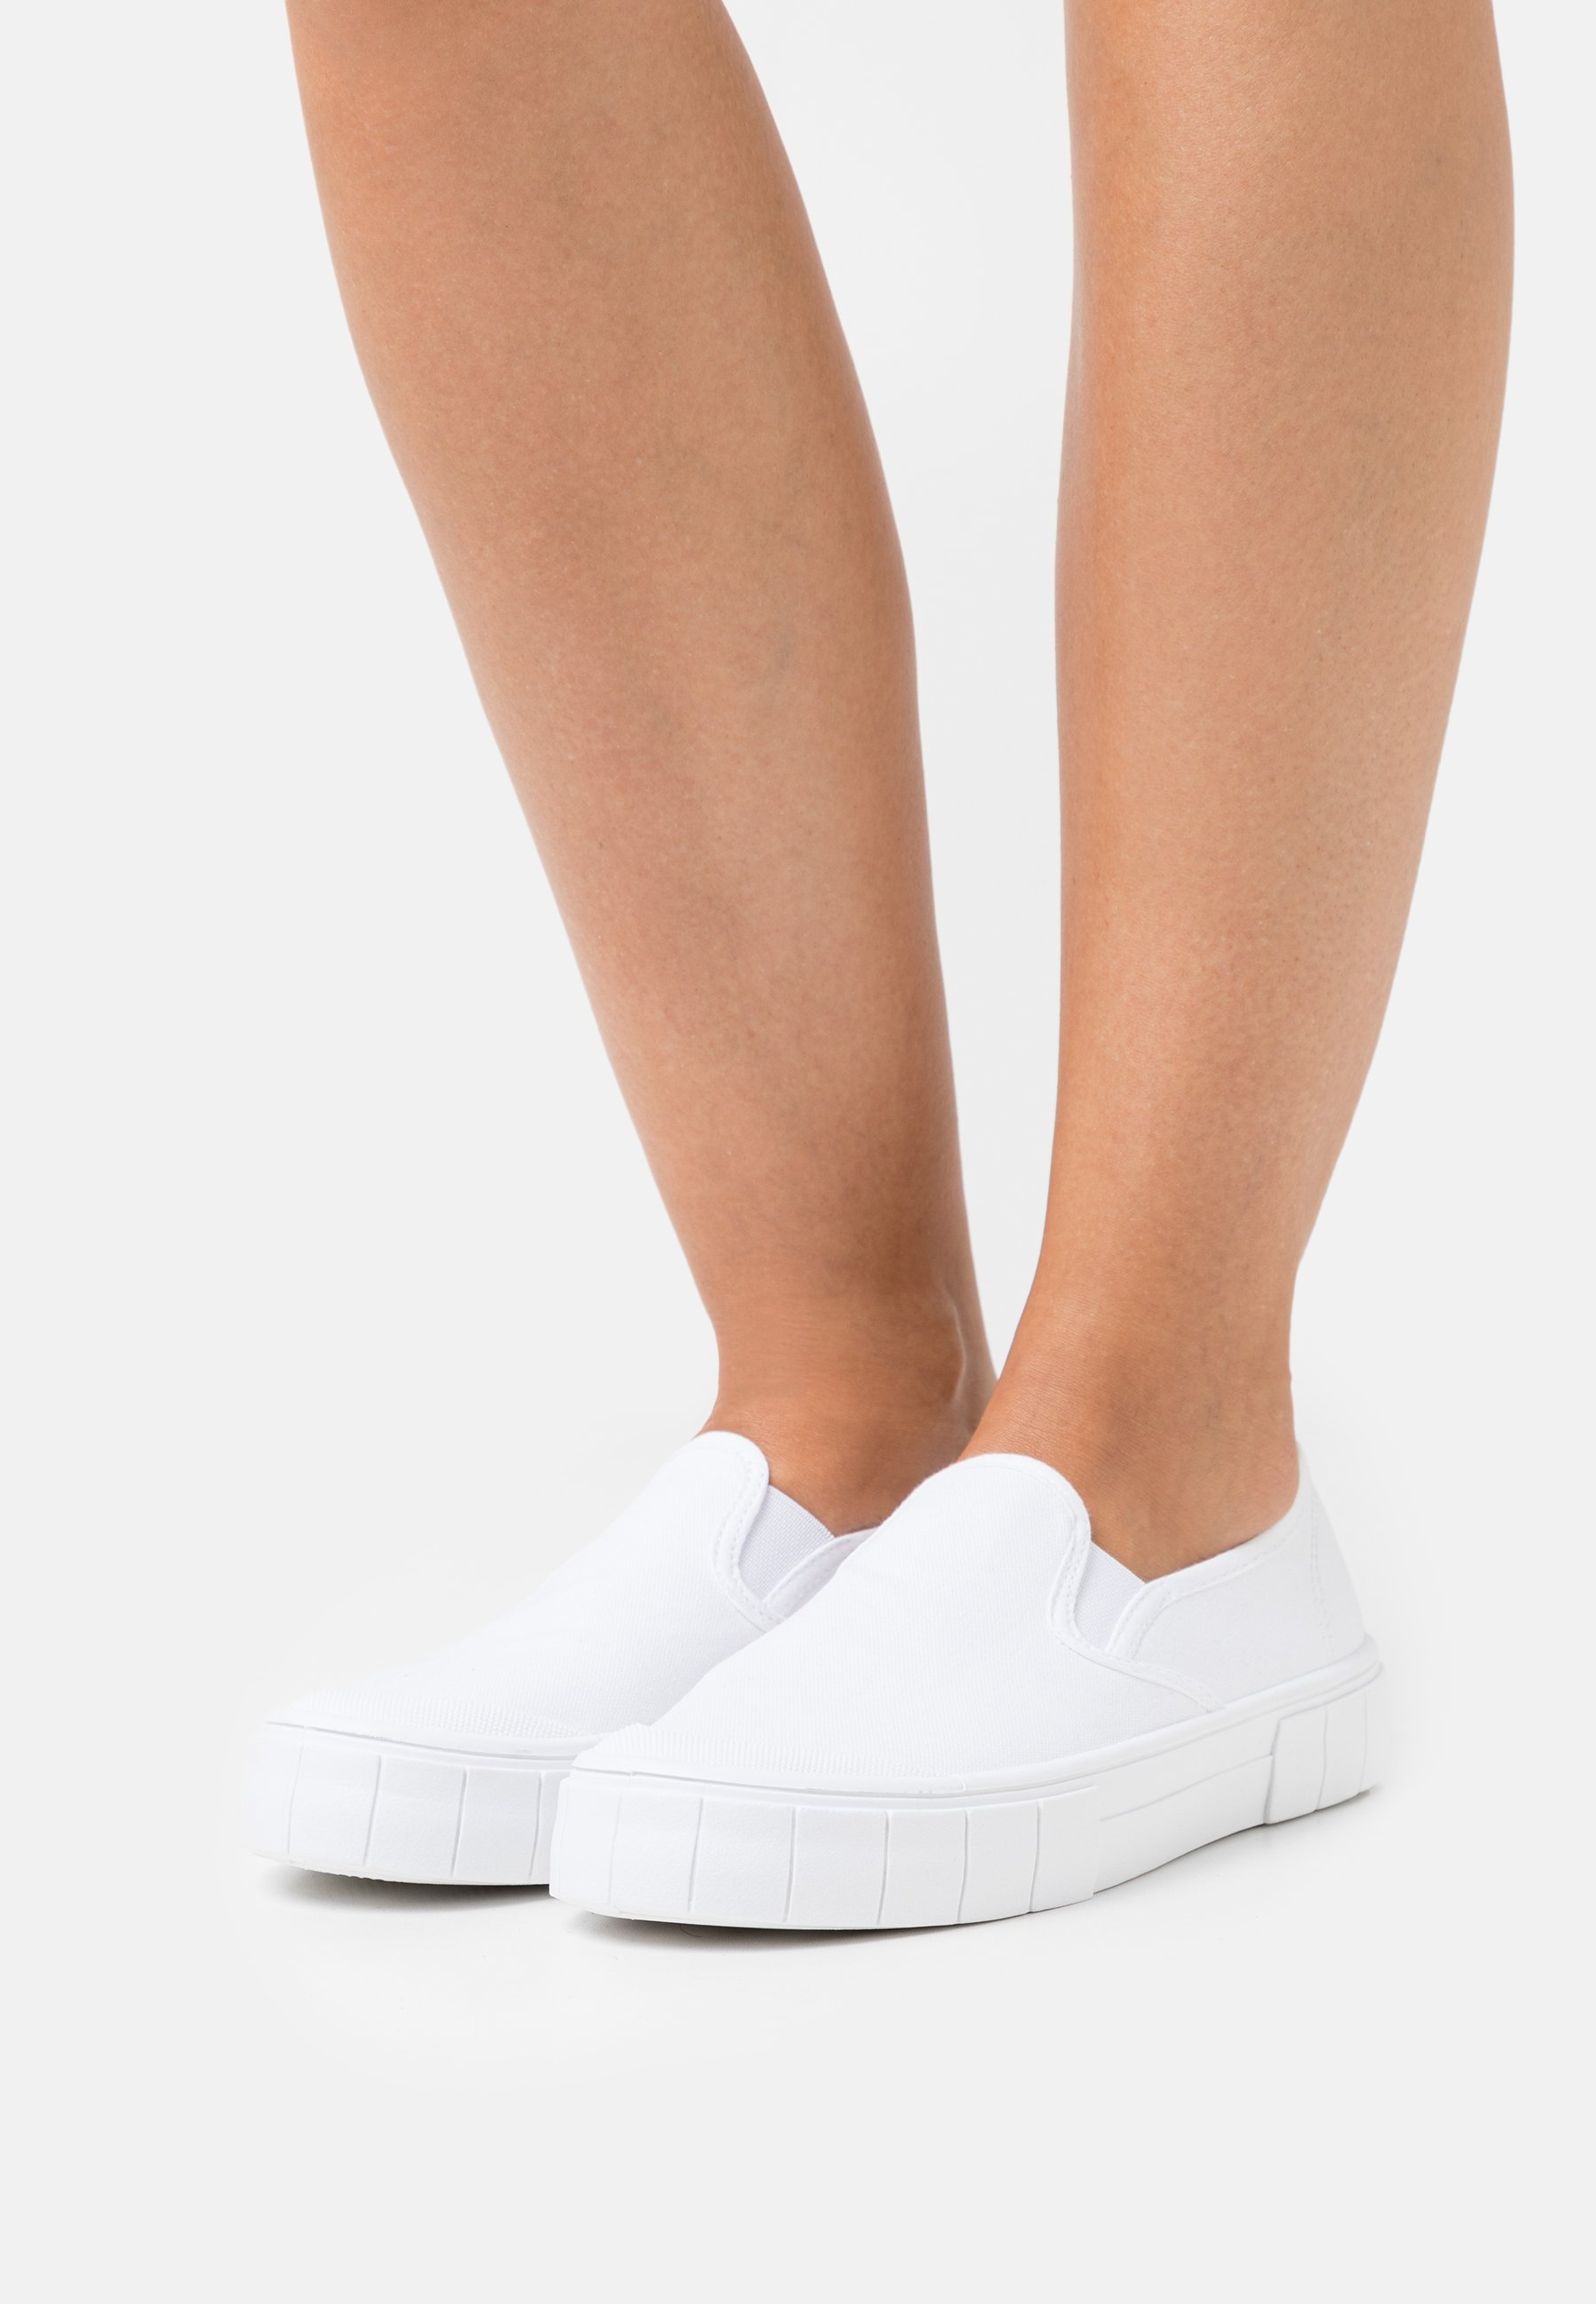 Donna PEYTON SLIP ON - Scarpe senza lacci